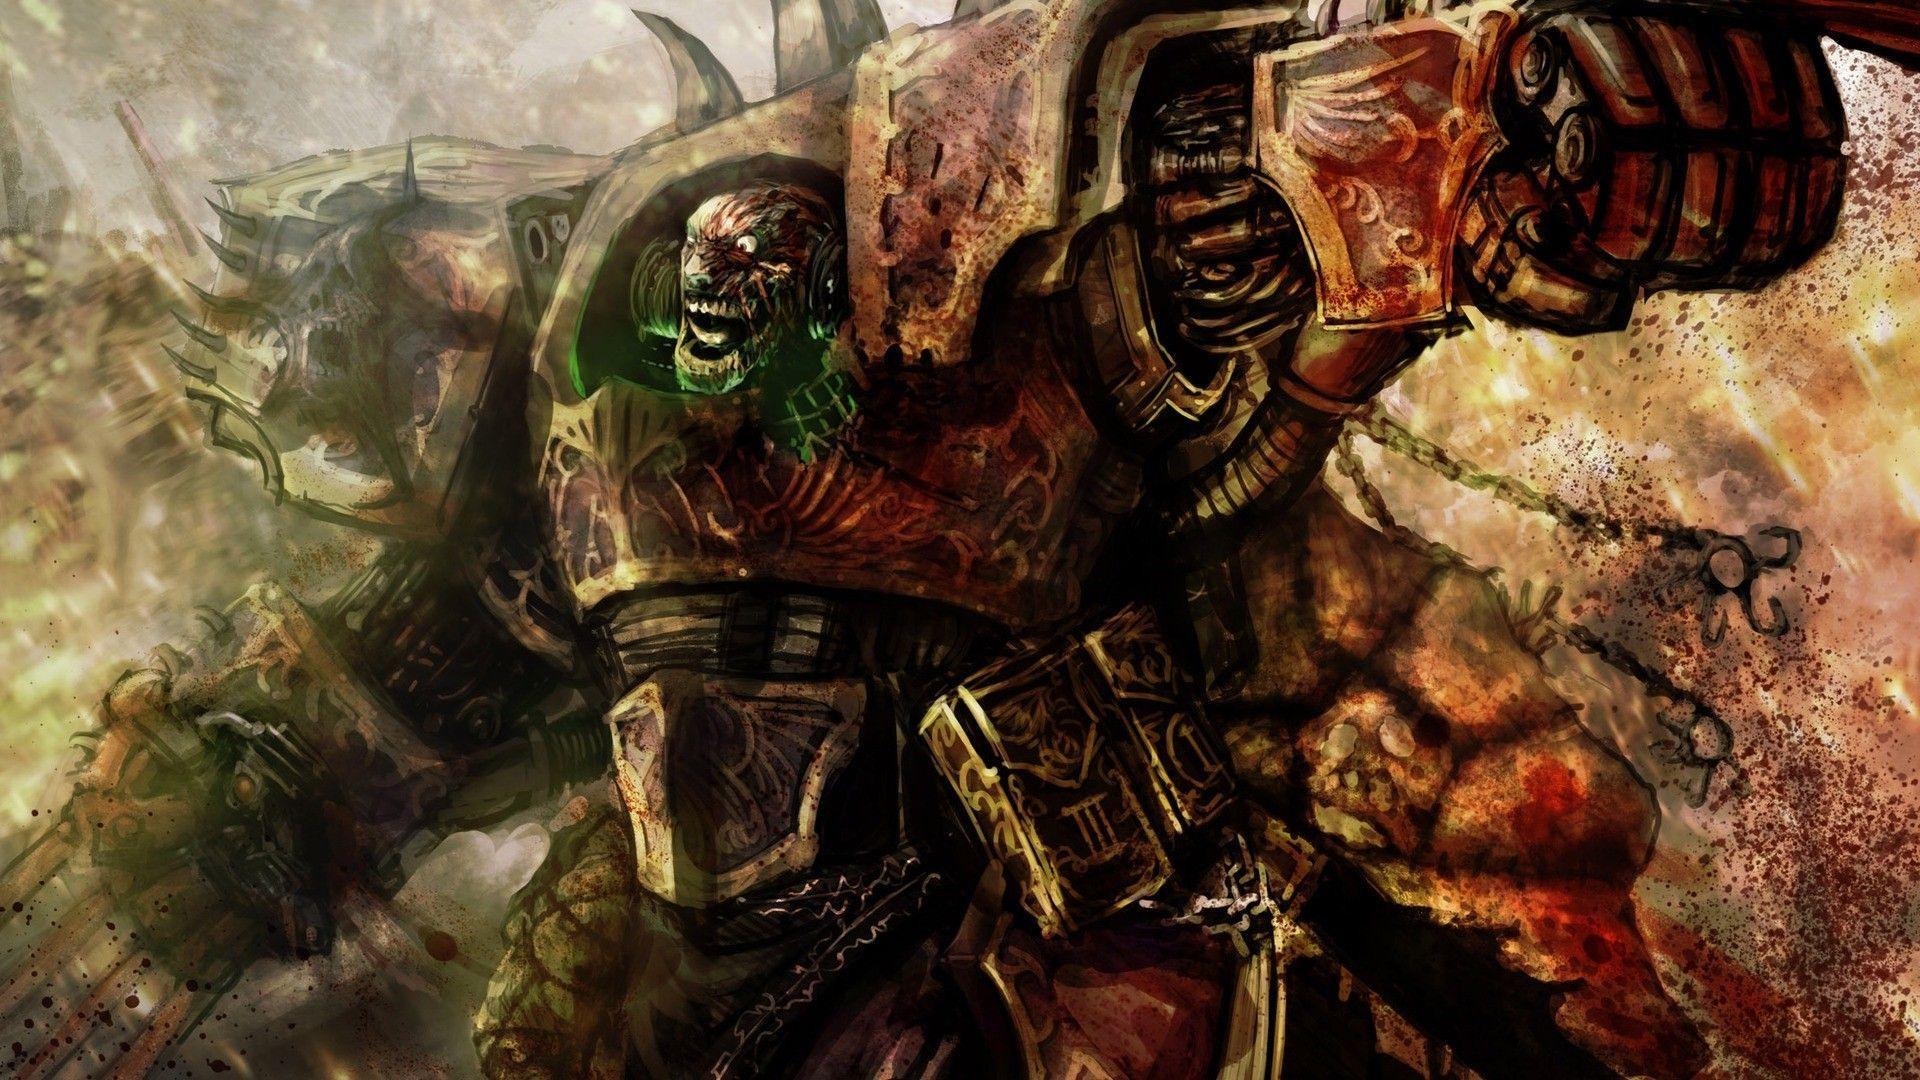 29 Warhammer Chaos Space Marine Logo Wallpaper On